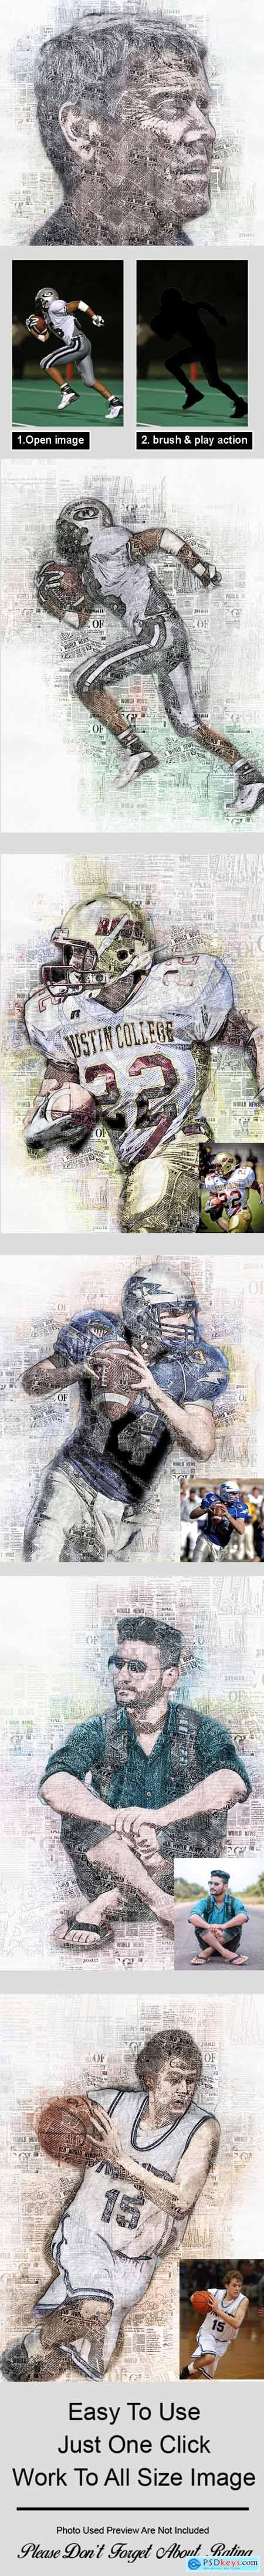 Newspaper Art Photoshop Action Vol 2 26325265